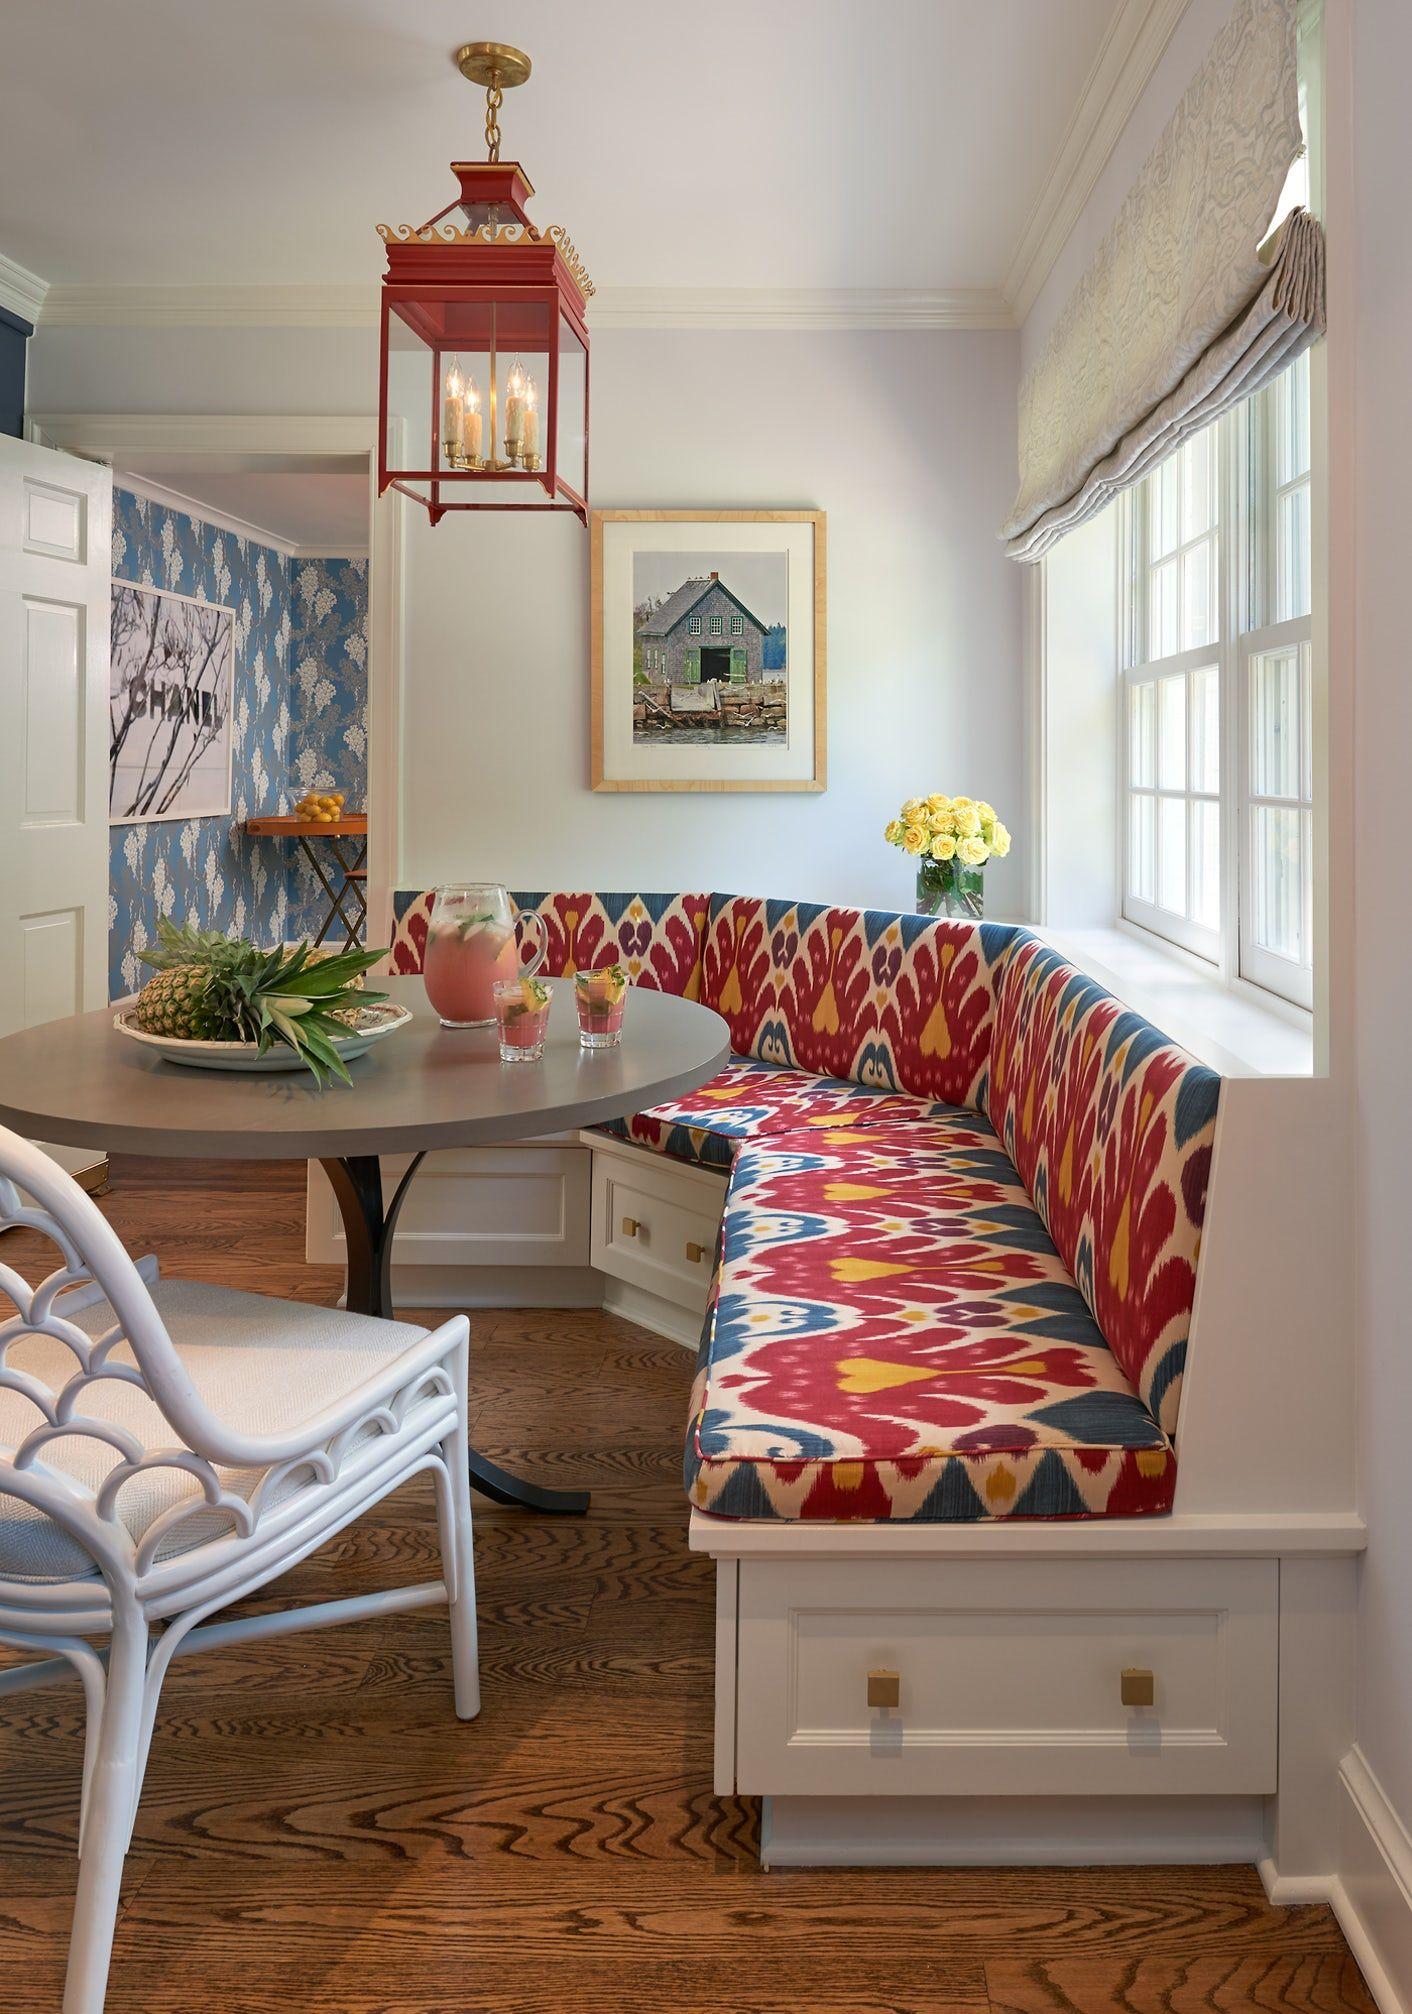 25 Charming Banquette Seating Ideas Gorgeous Kitchen Banquette